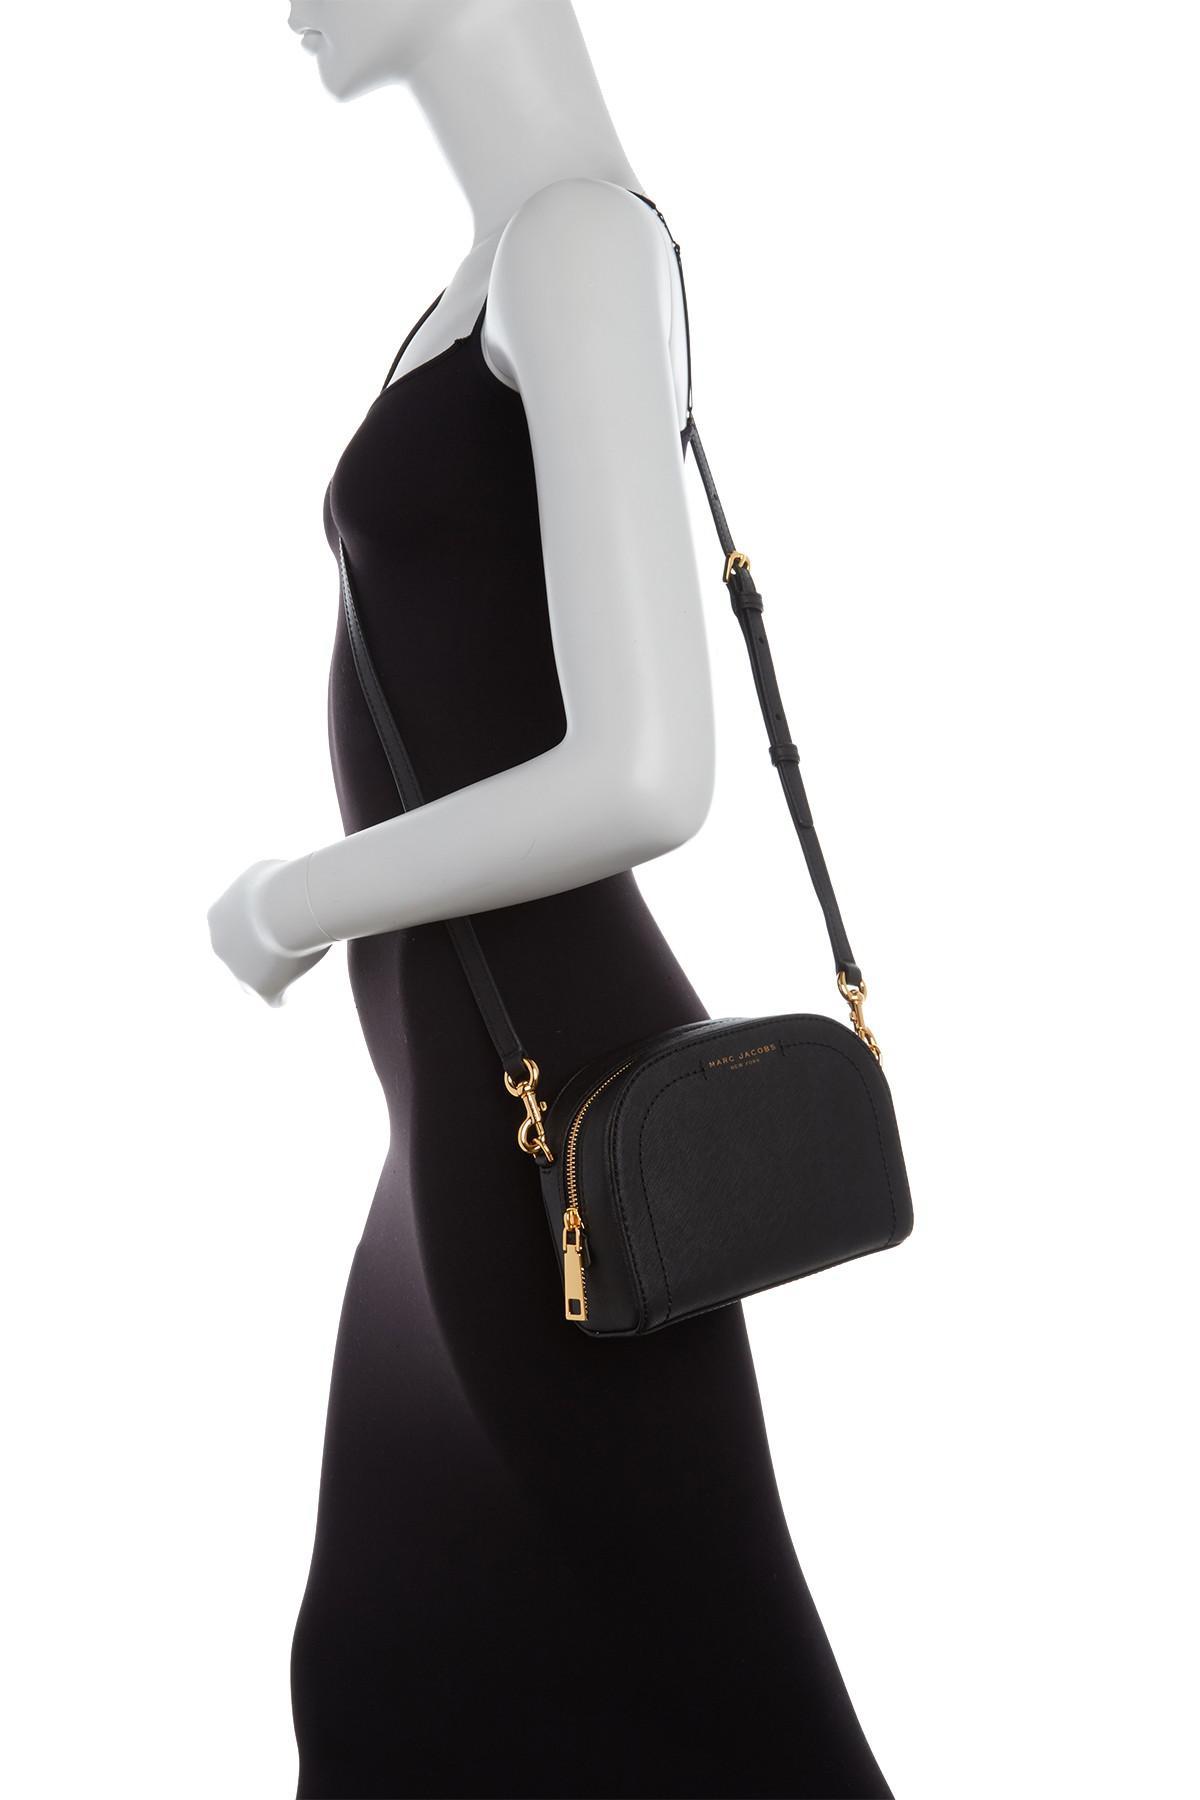 6beef699007d5 Marc Jacobs - Black Playback Leather Crossbody Bag - Lyst. View fullscreen